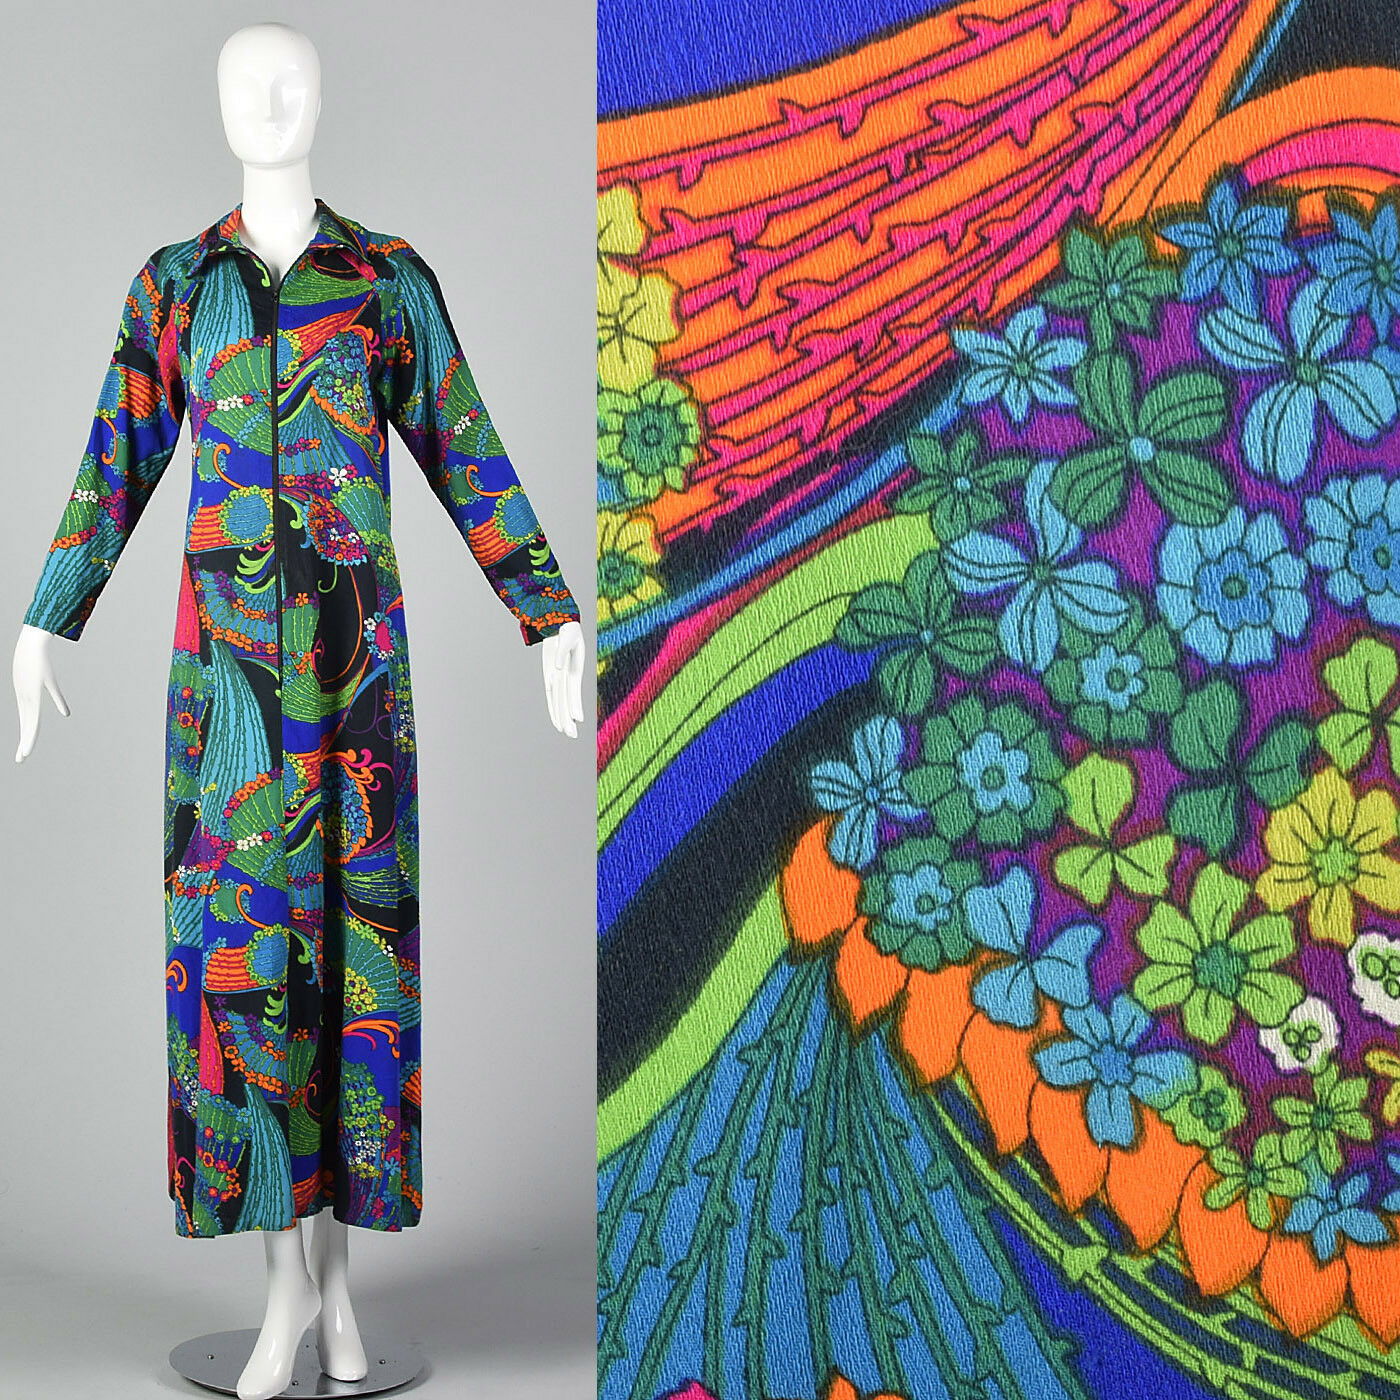 L 1970s Long Sleeve Maxi Dress Zip Front Bright MultiFarbe Print Loungewear 70s